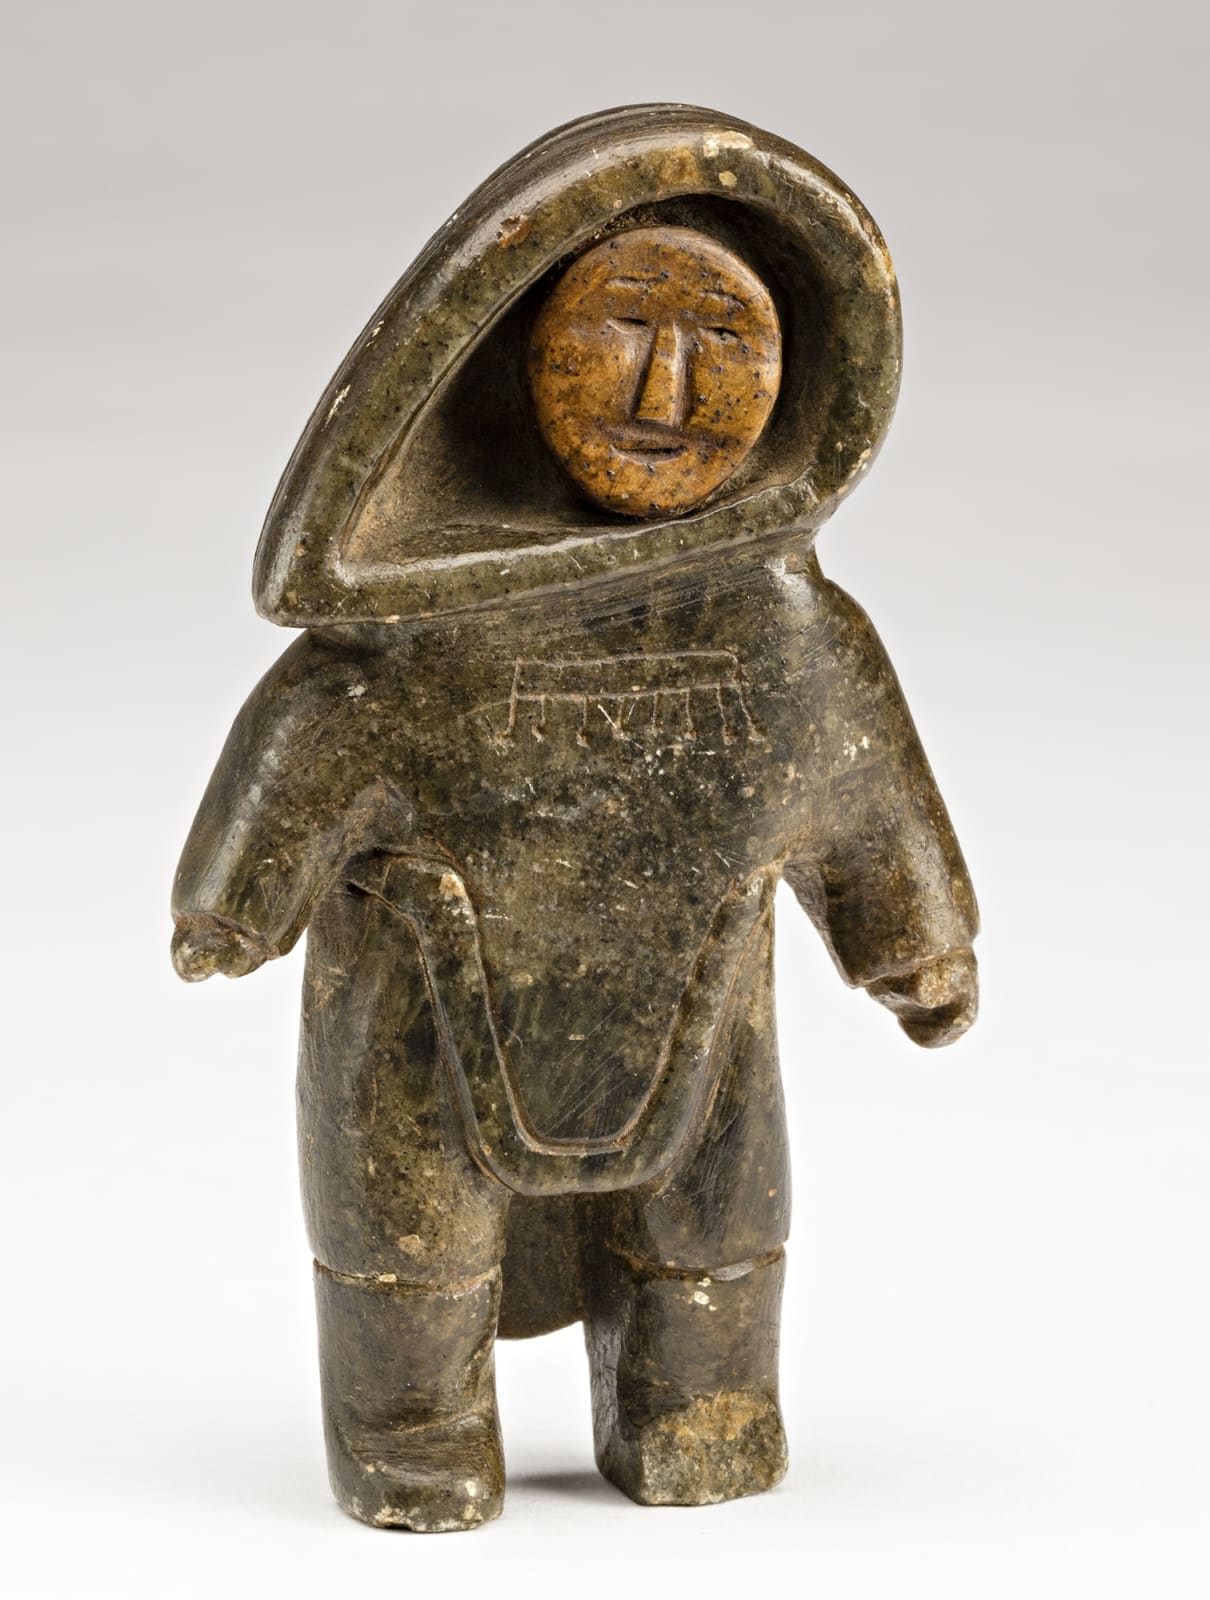 Lot 2 UNIDENTIFIED ARTIST, INUKJUAK (PORT HARRISON) Standing Woman, c. 1949-50 stone, 3.75 x 2.25 x 1 in (9.5 x 5.7 x 2.5 cm) Estimate: $2,000 — $3,000 Price realized: $6,000